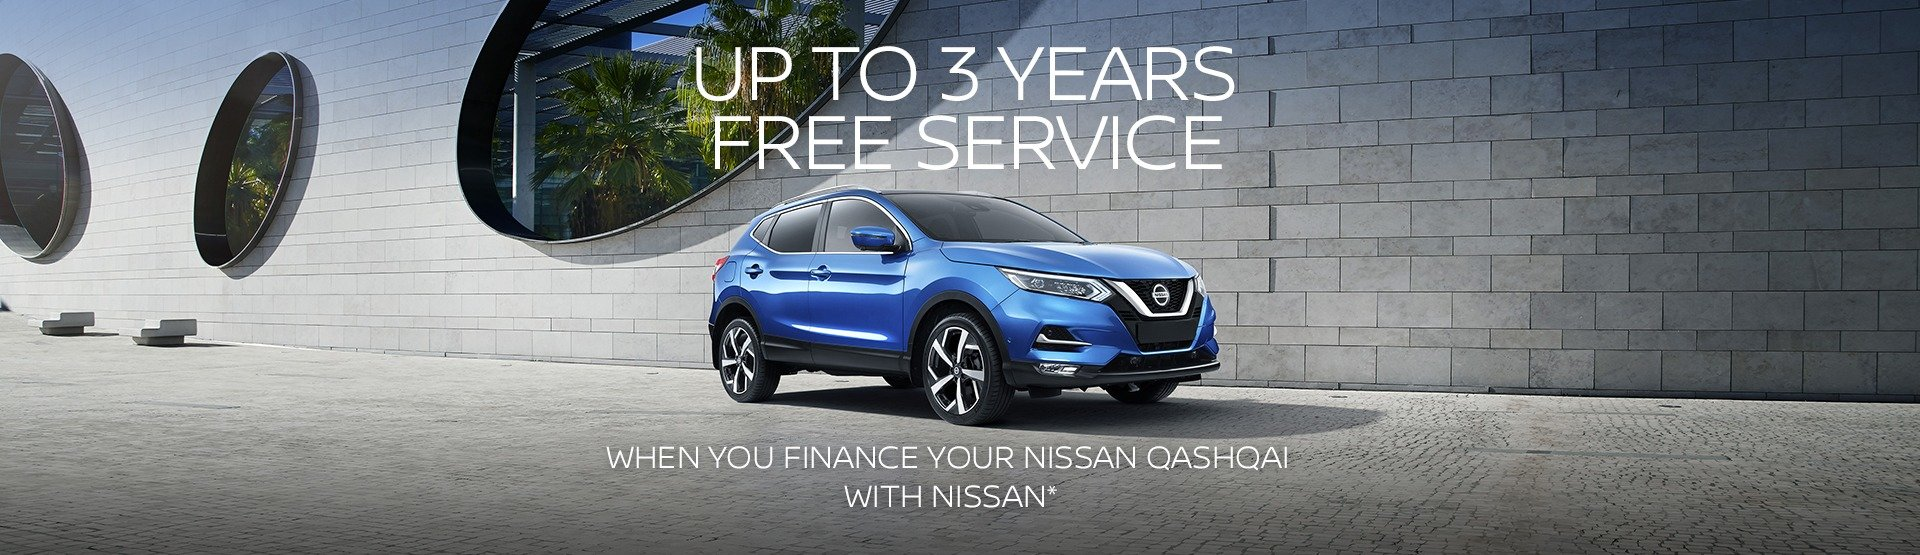 Nissan-Qashqai-3-years-free-service